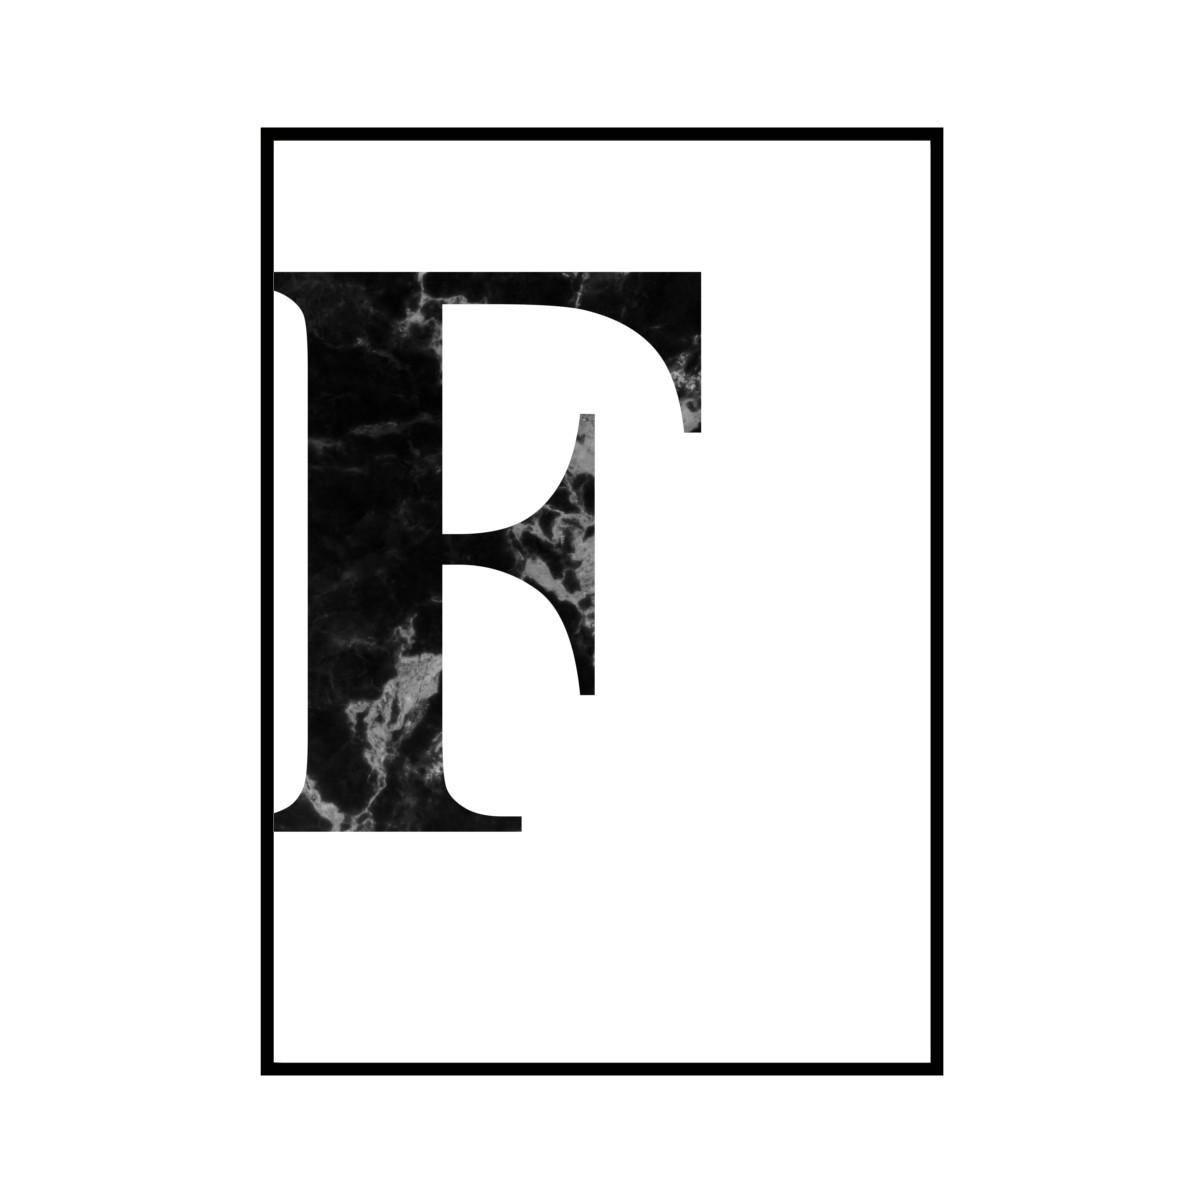 """F"" 黒大理石 - Black marble - ALPHAシリーズ [SD-000507] B4サイズ フレームセット"